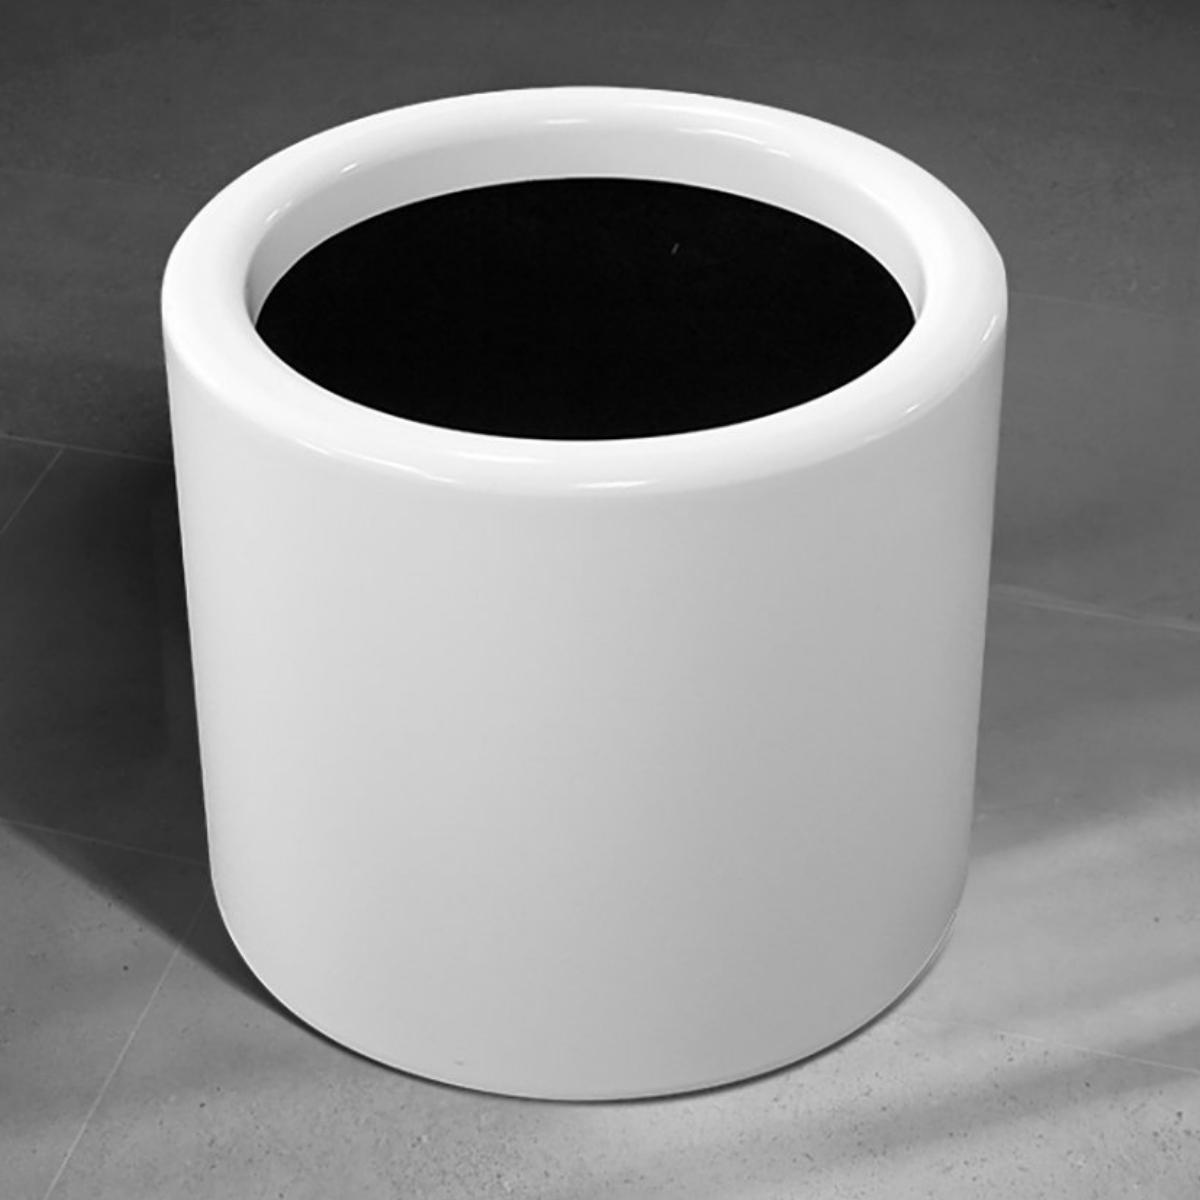 Drum Modular Planter